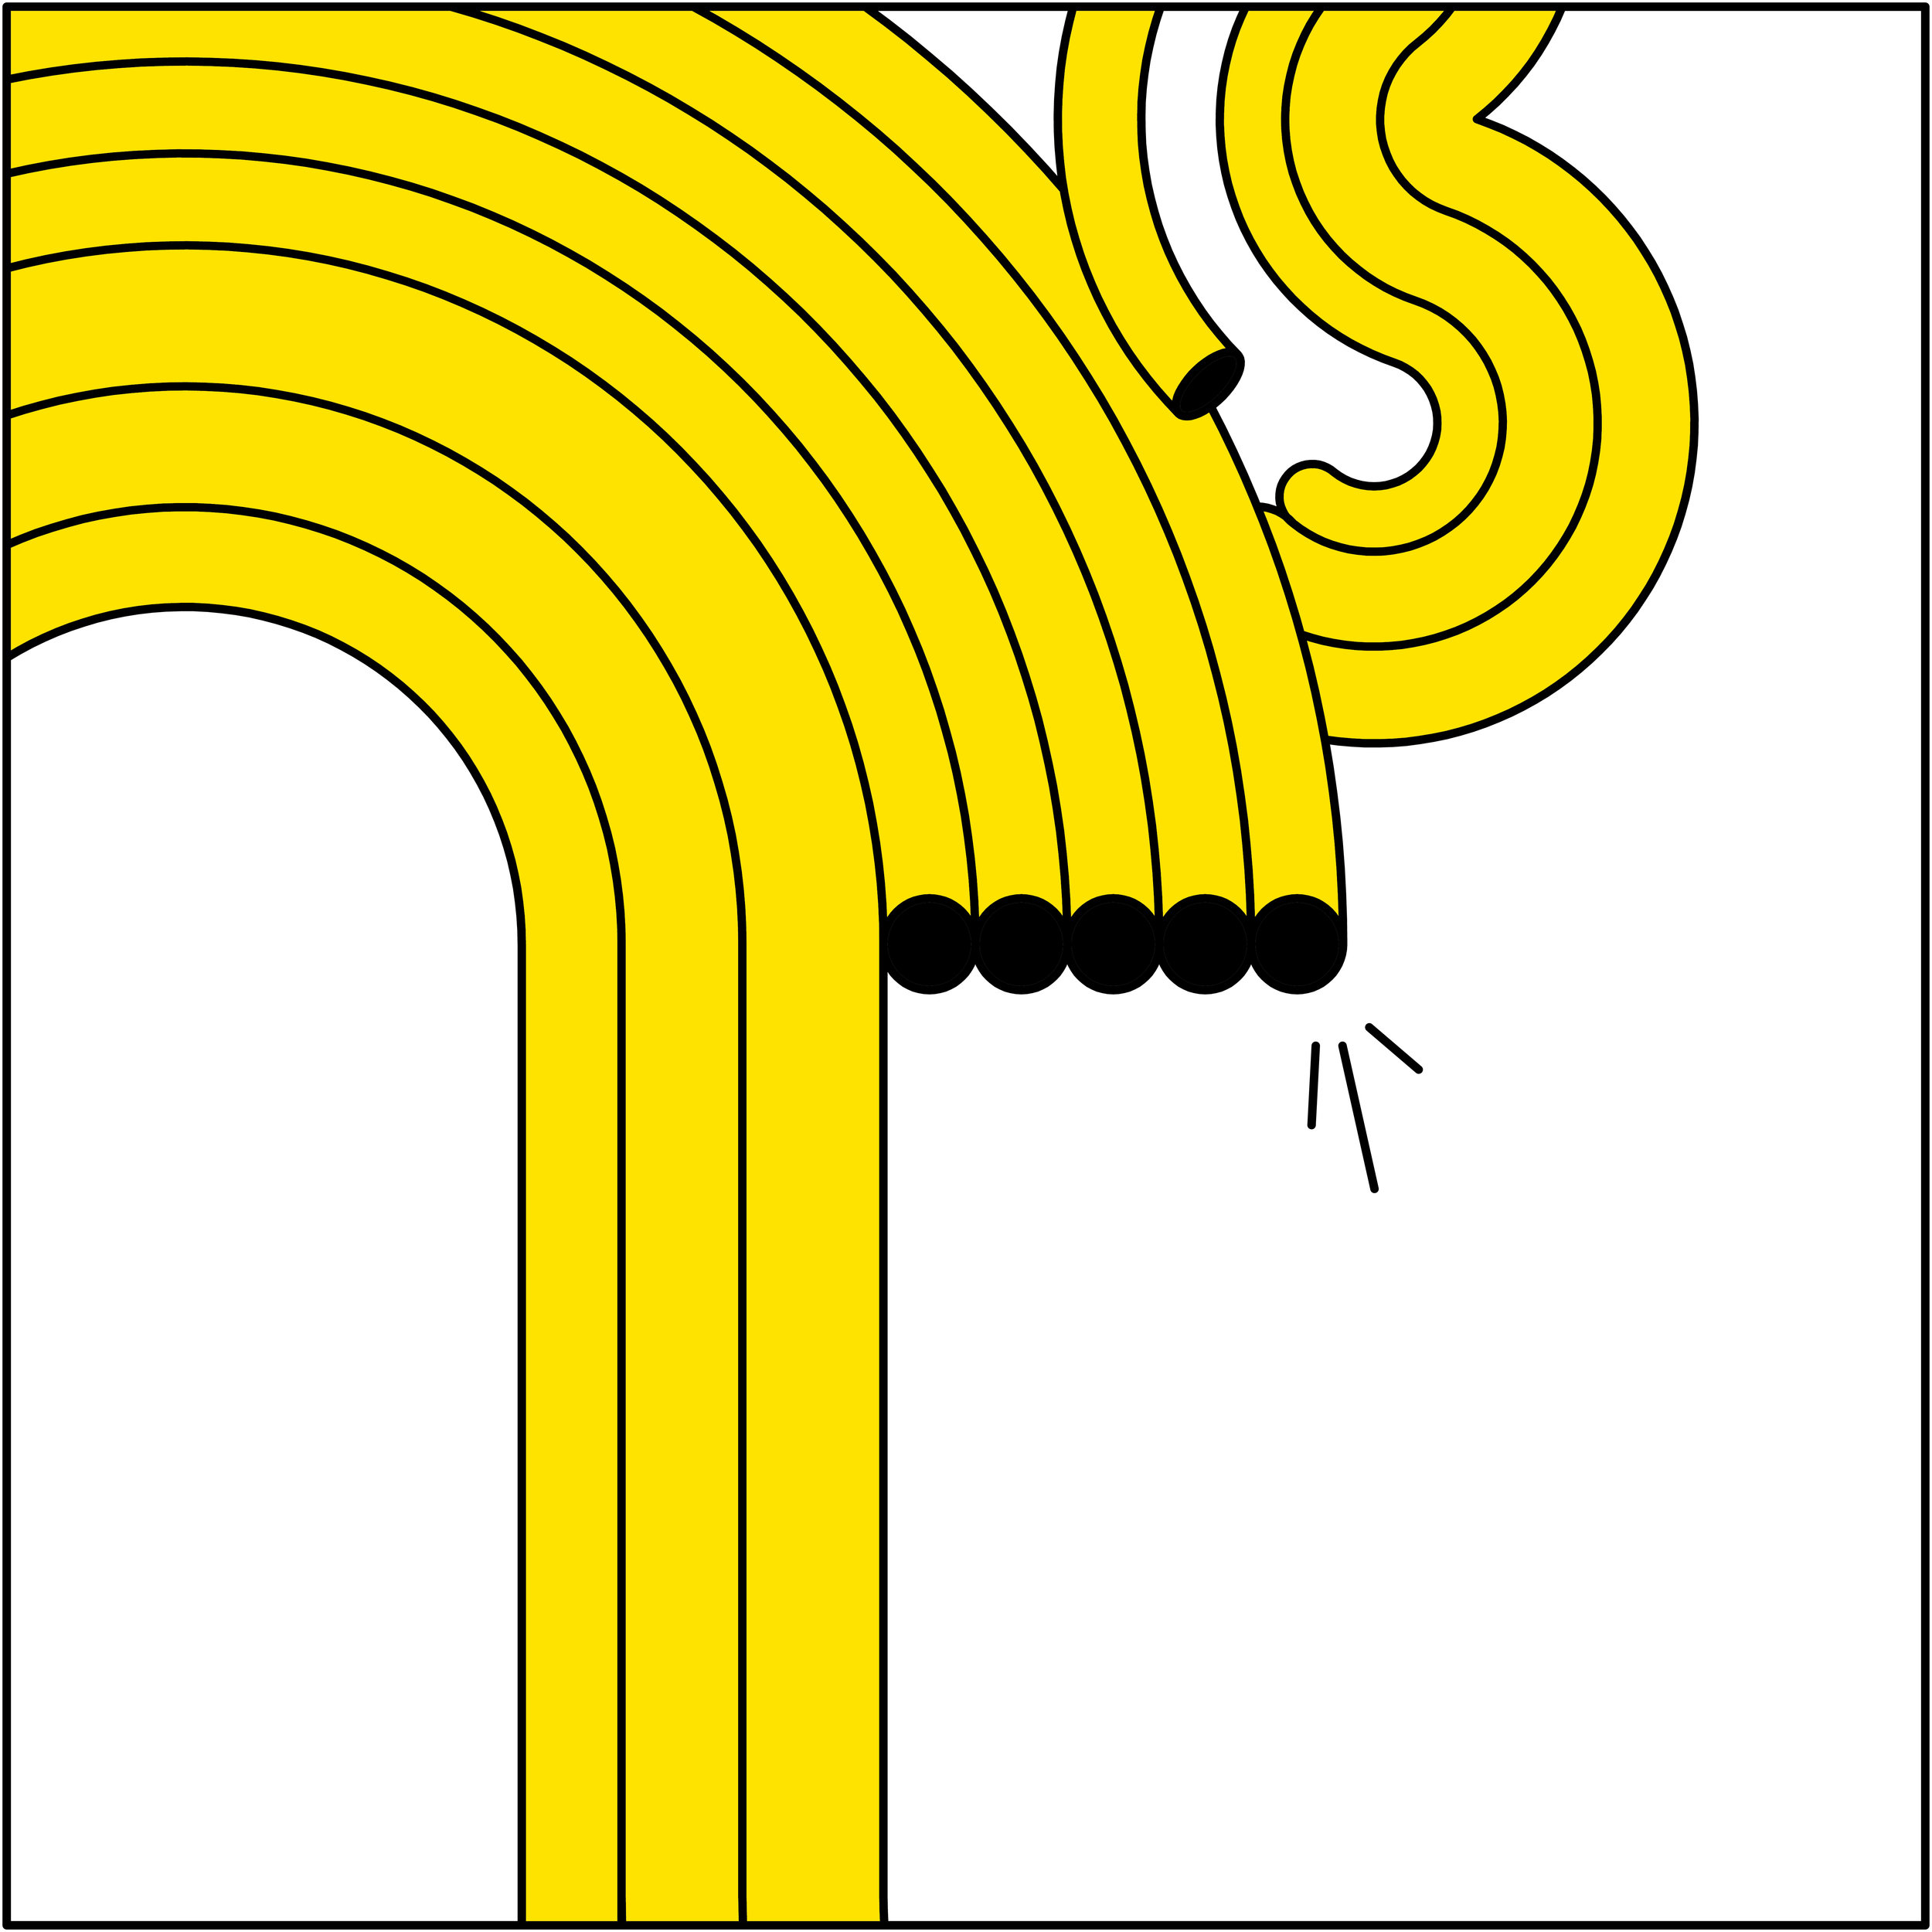 spaghetti yellow - 007.jpg